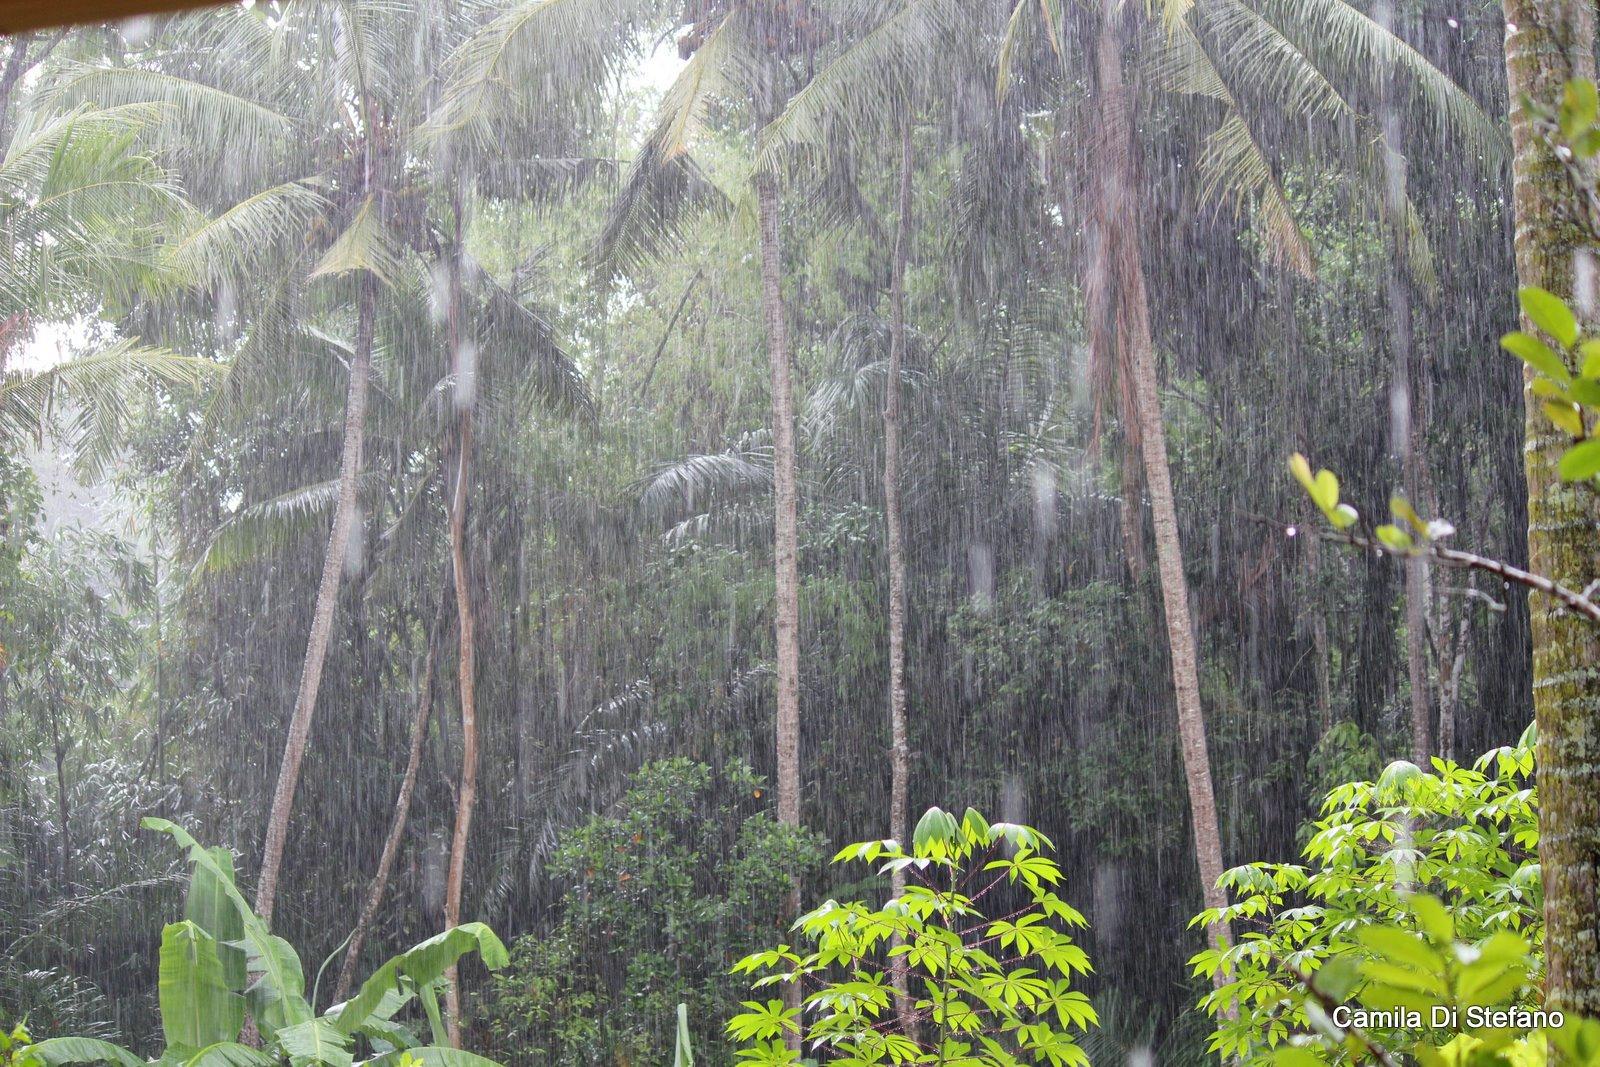 Downpouring rain